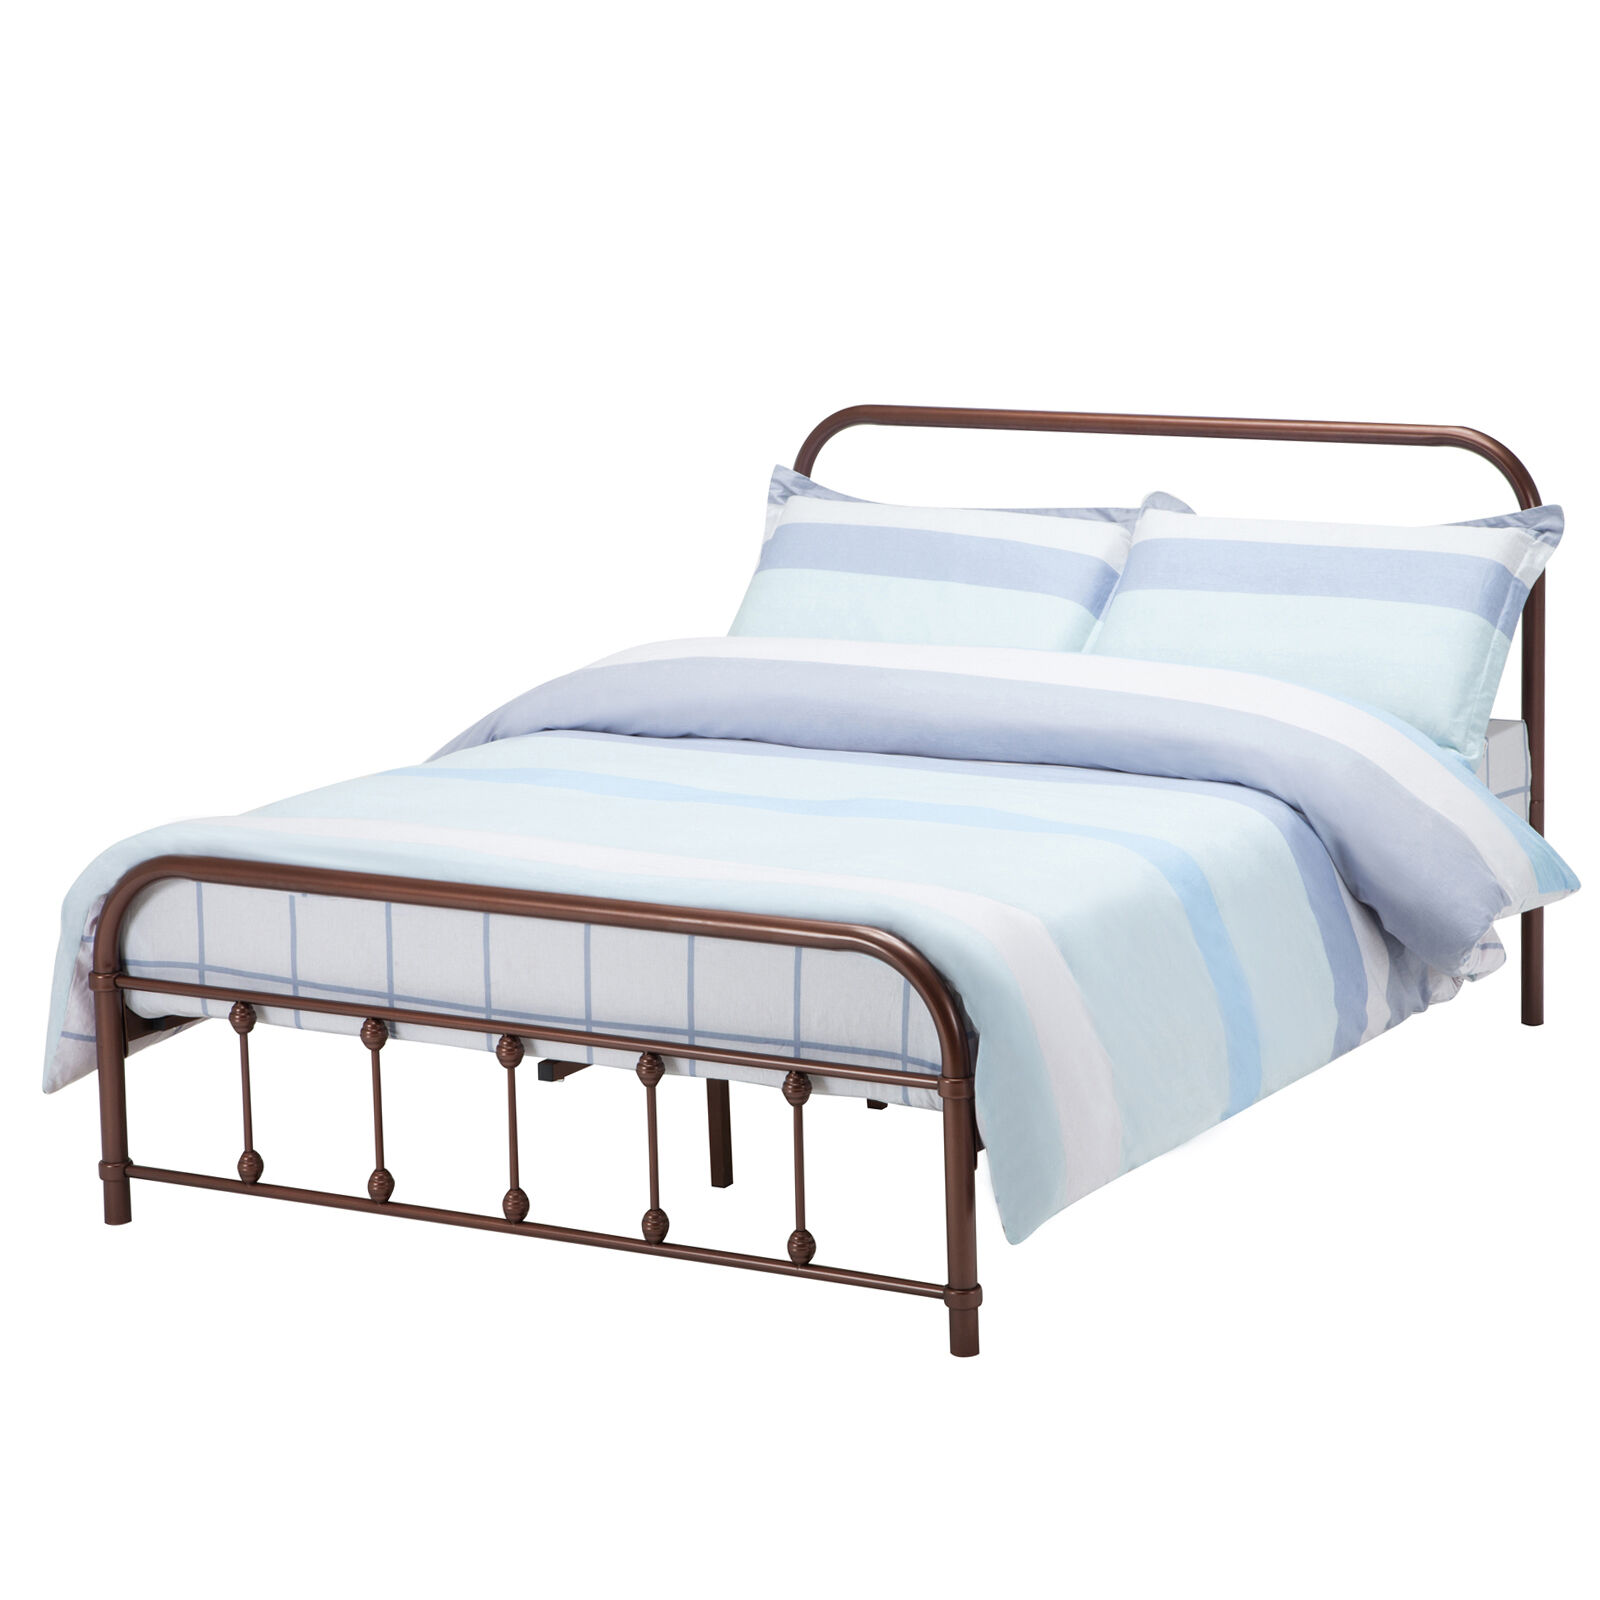 Full Size Metal Bed Frame Platform W Headboard Footboard